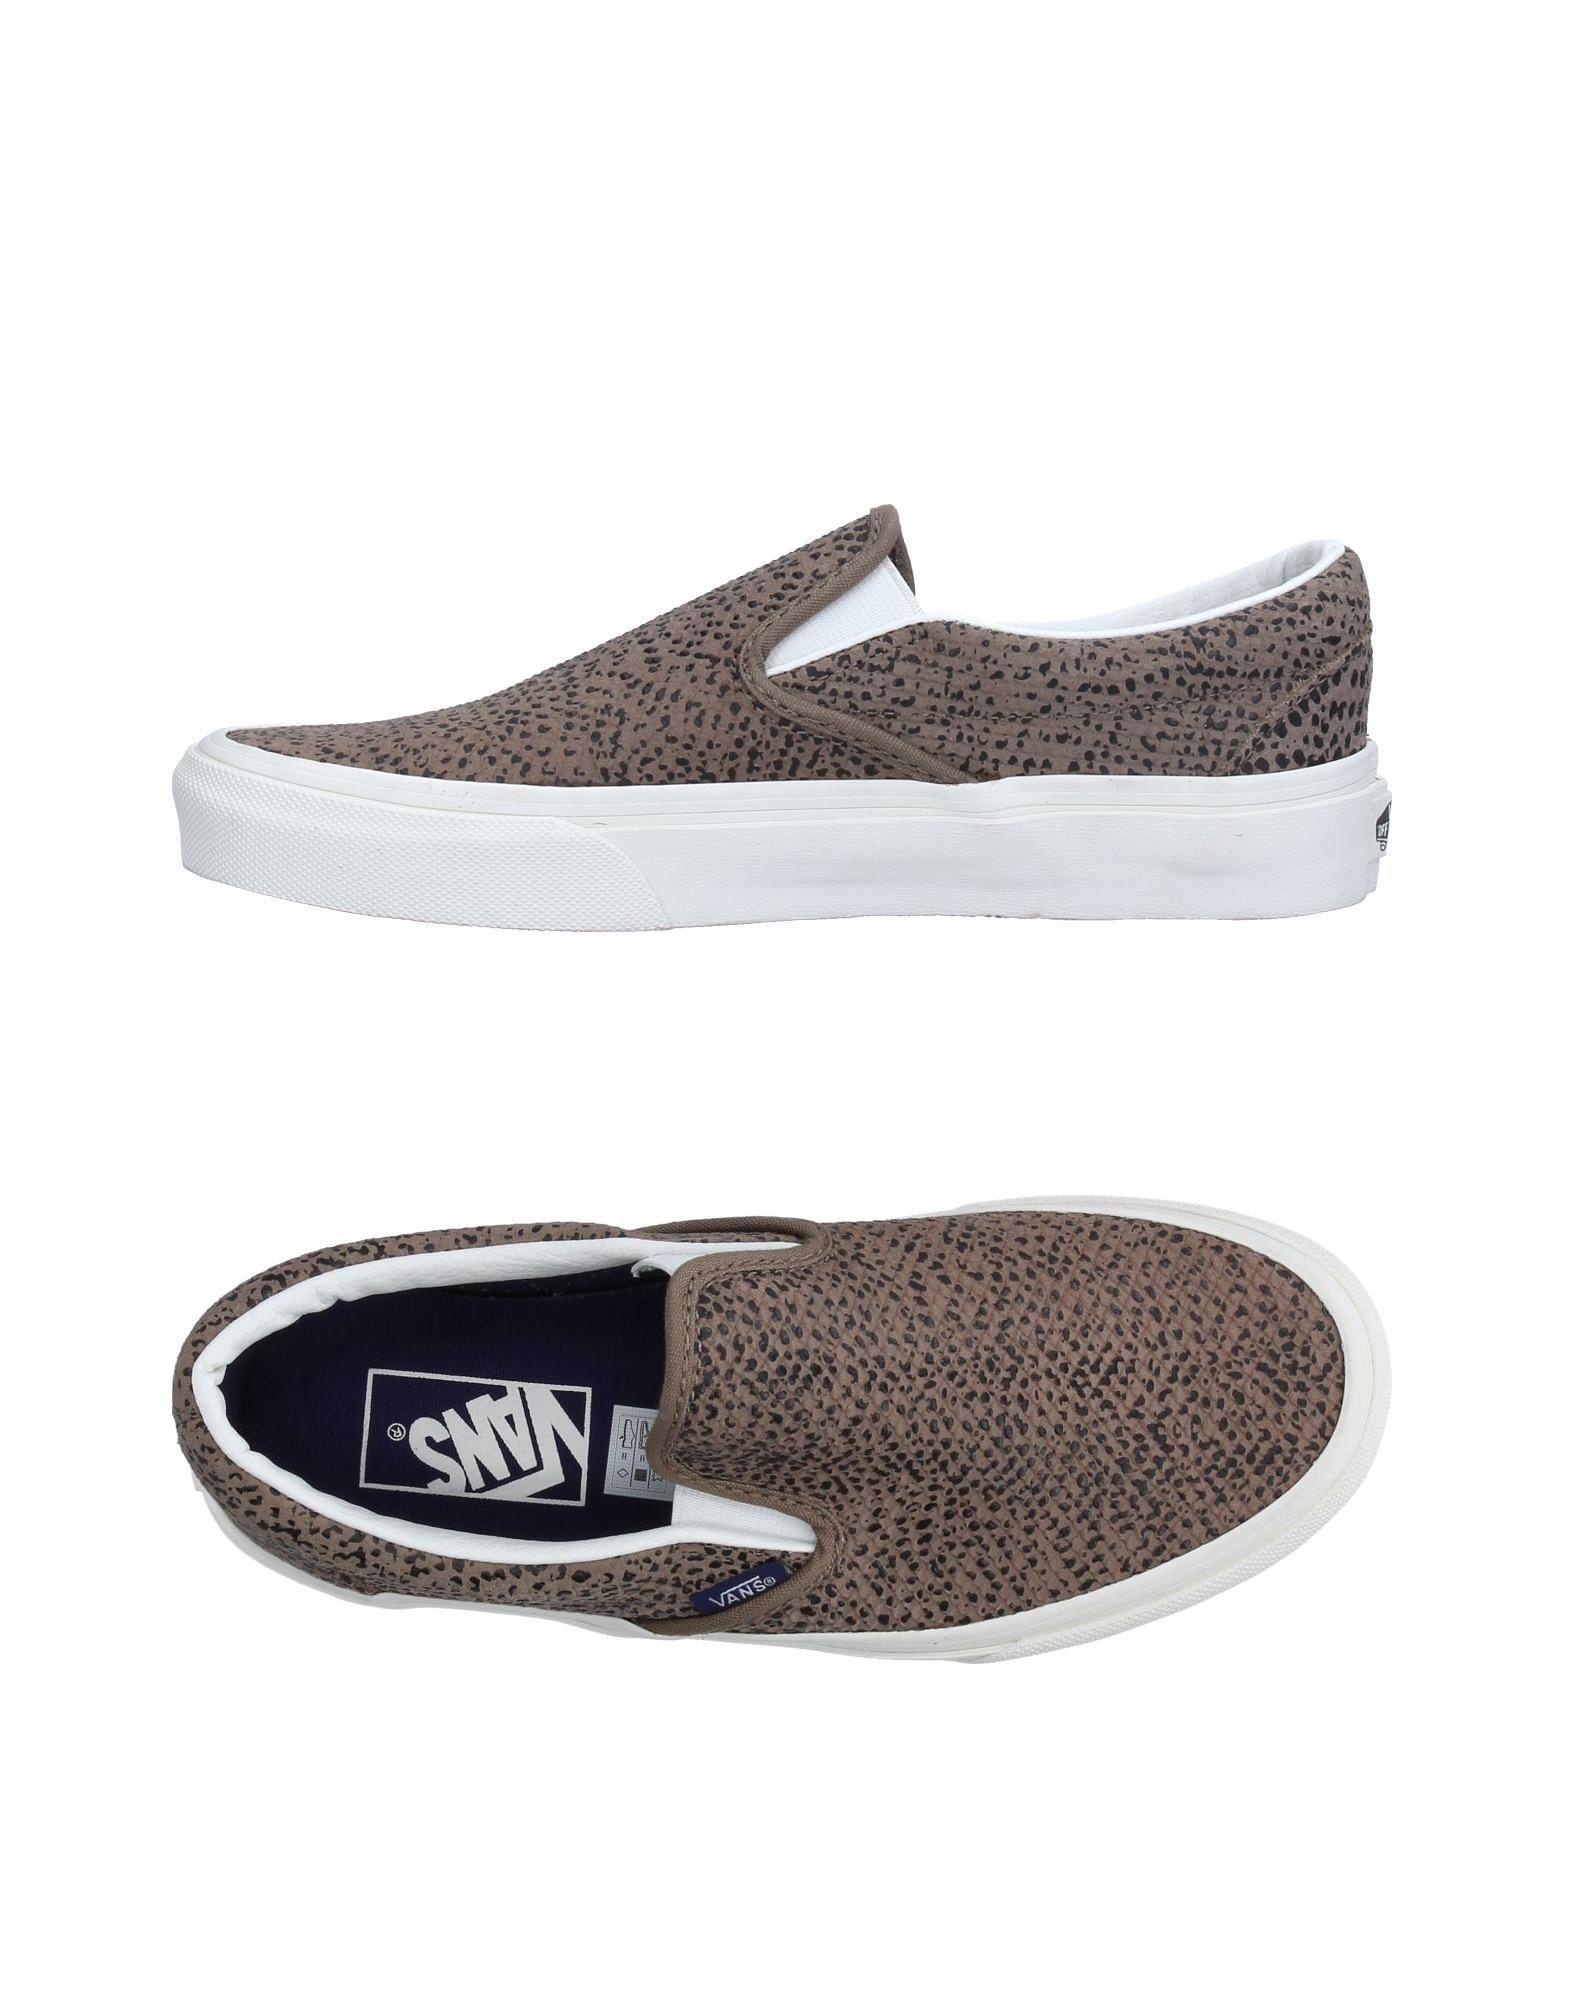 eabbd13cec Vans Sneakers - Women Vans Sneakers online on YOOX Estonia - 11220497